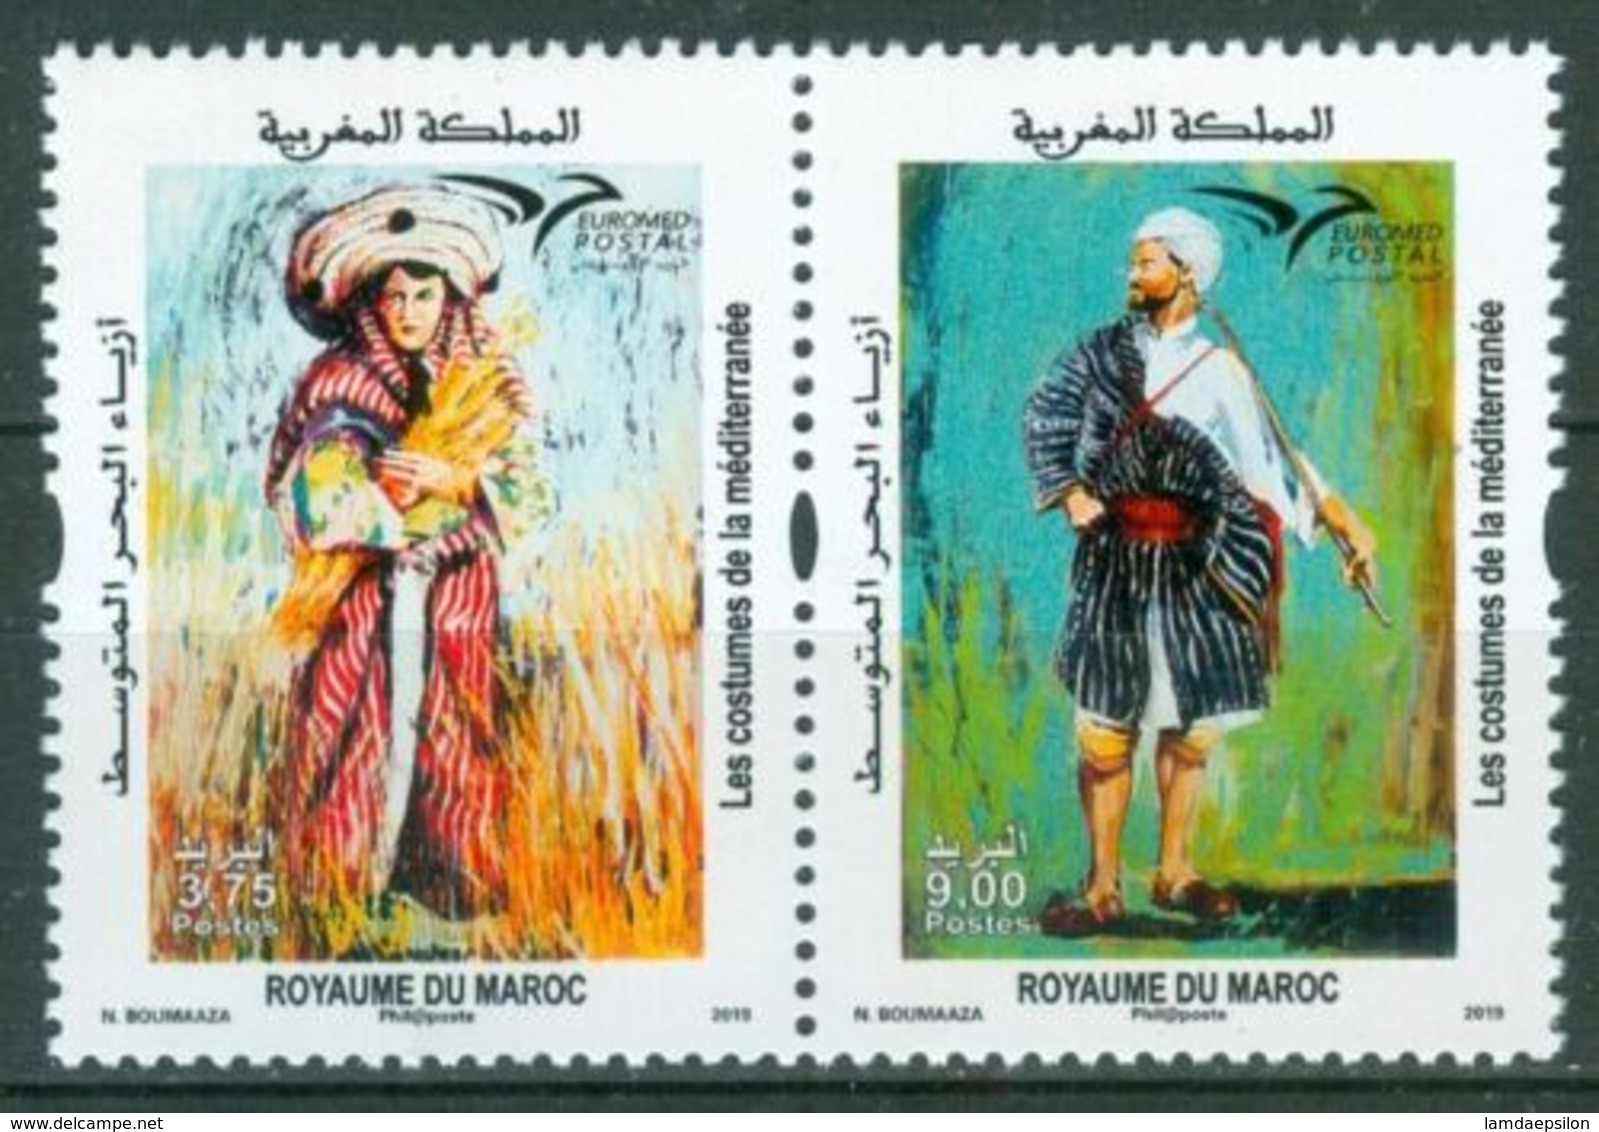 MOROCCO MAROC MAROKKO DEUX TIMBRES LES COSTUMES DE LA MEDITERRANEE 2019 - Morocco (1956-...)